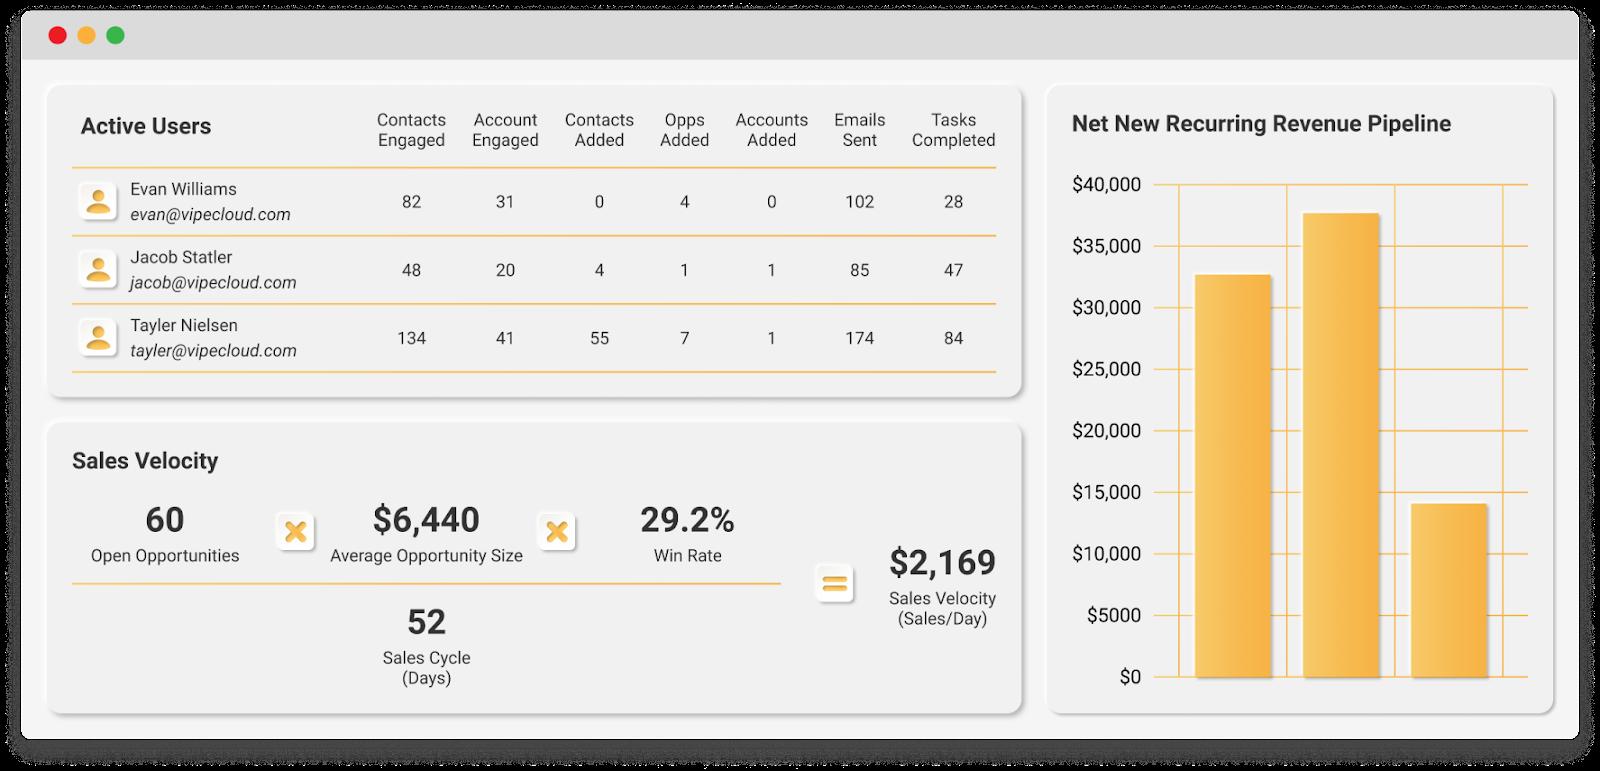 Mockup of VipeCloud sales CRM reporting